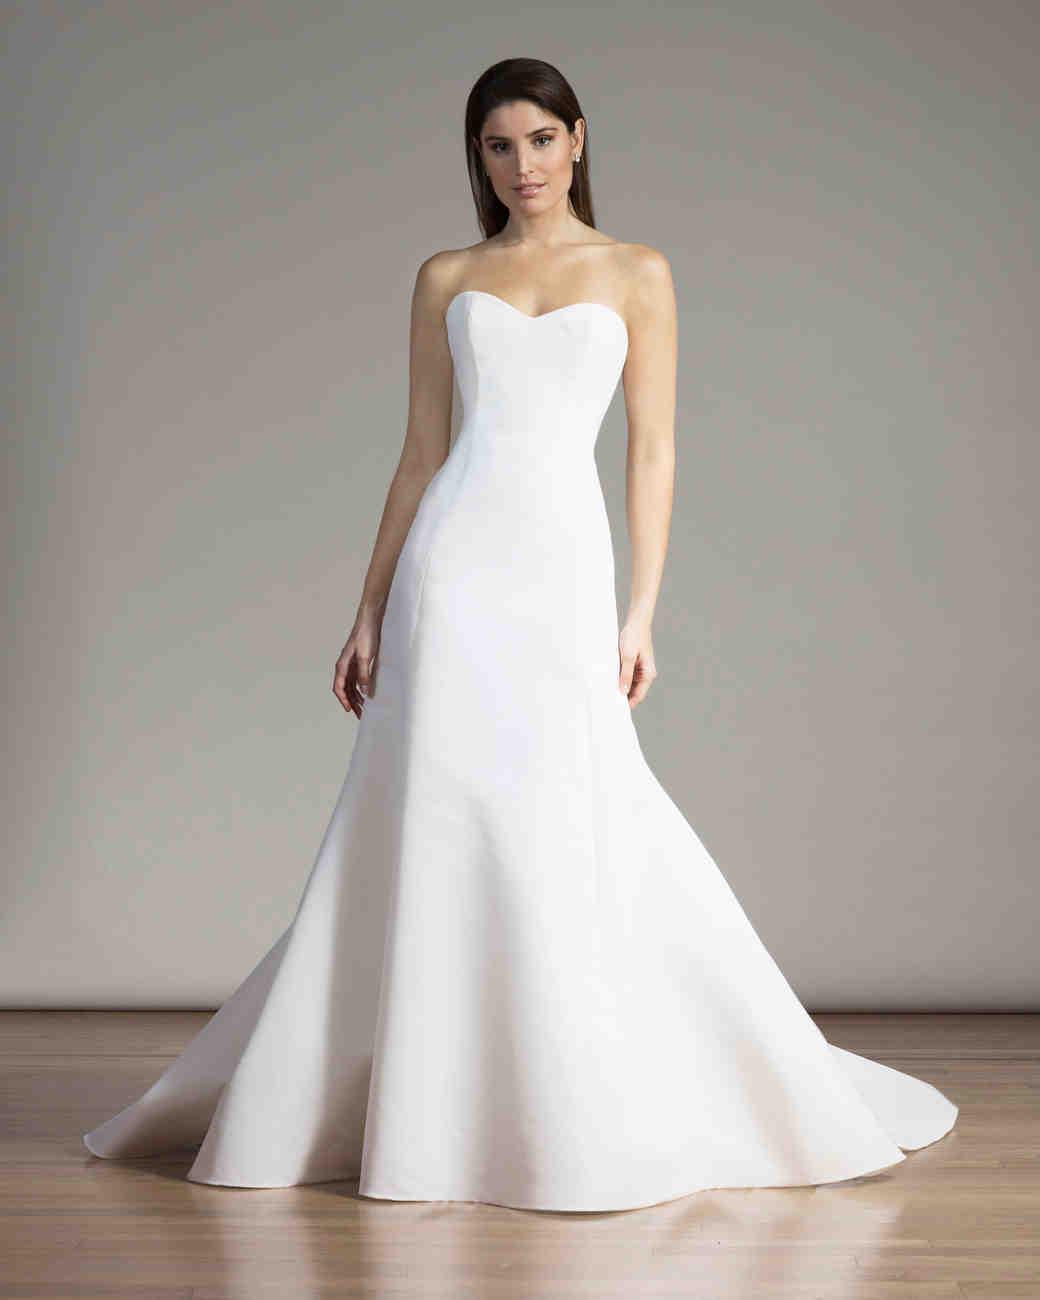 simple wedding dresses all white wedding dress Liancarlo Simple All White Wedding Dress